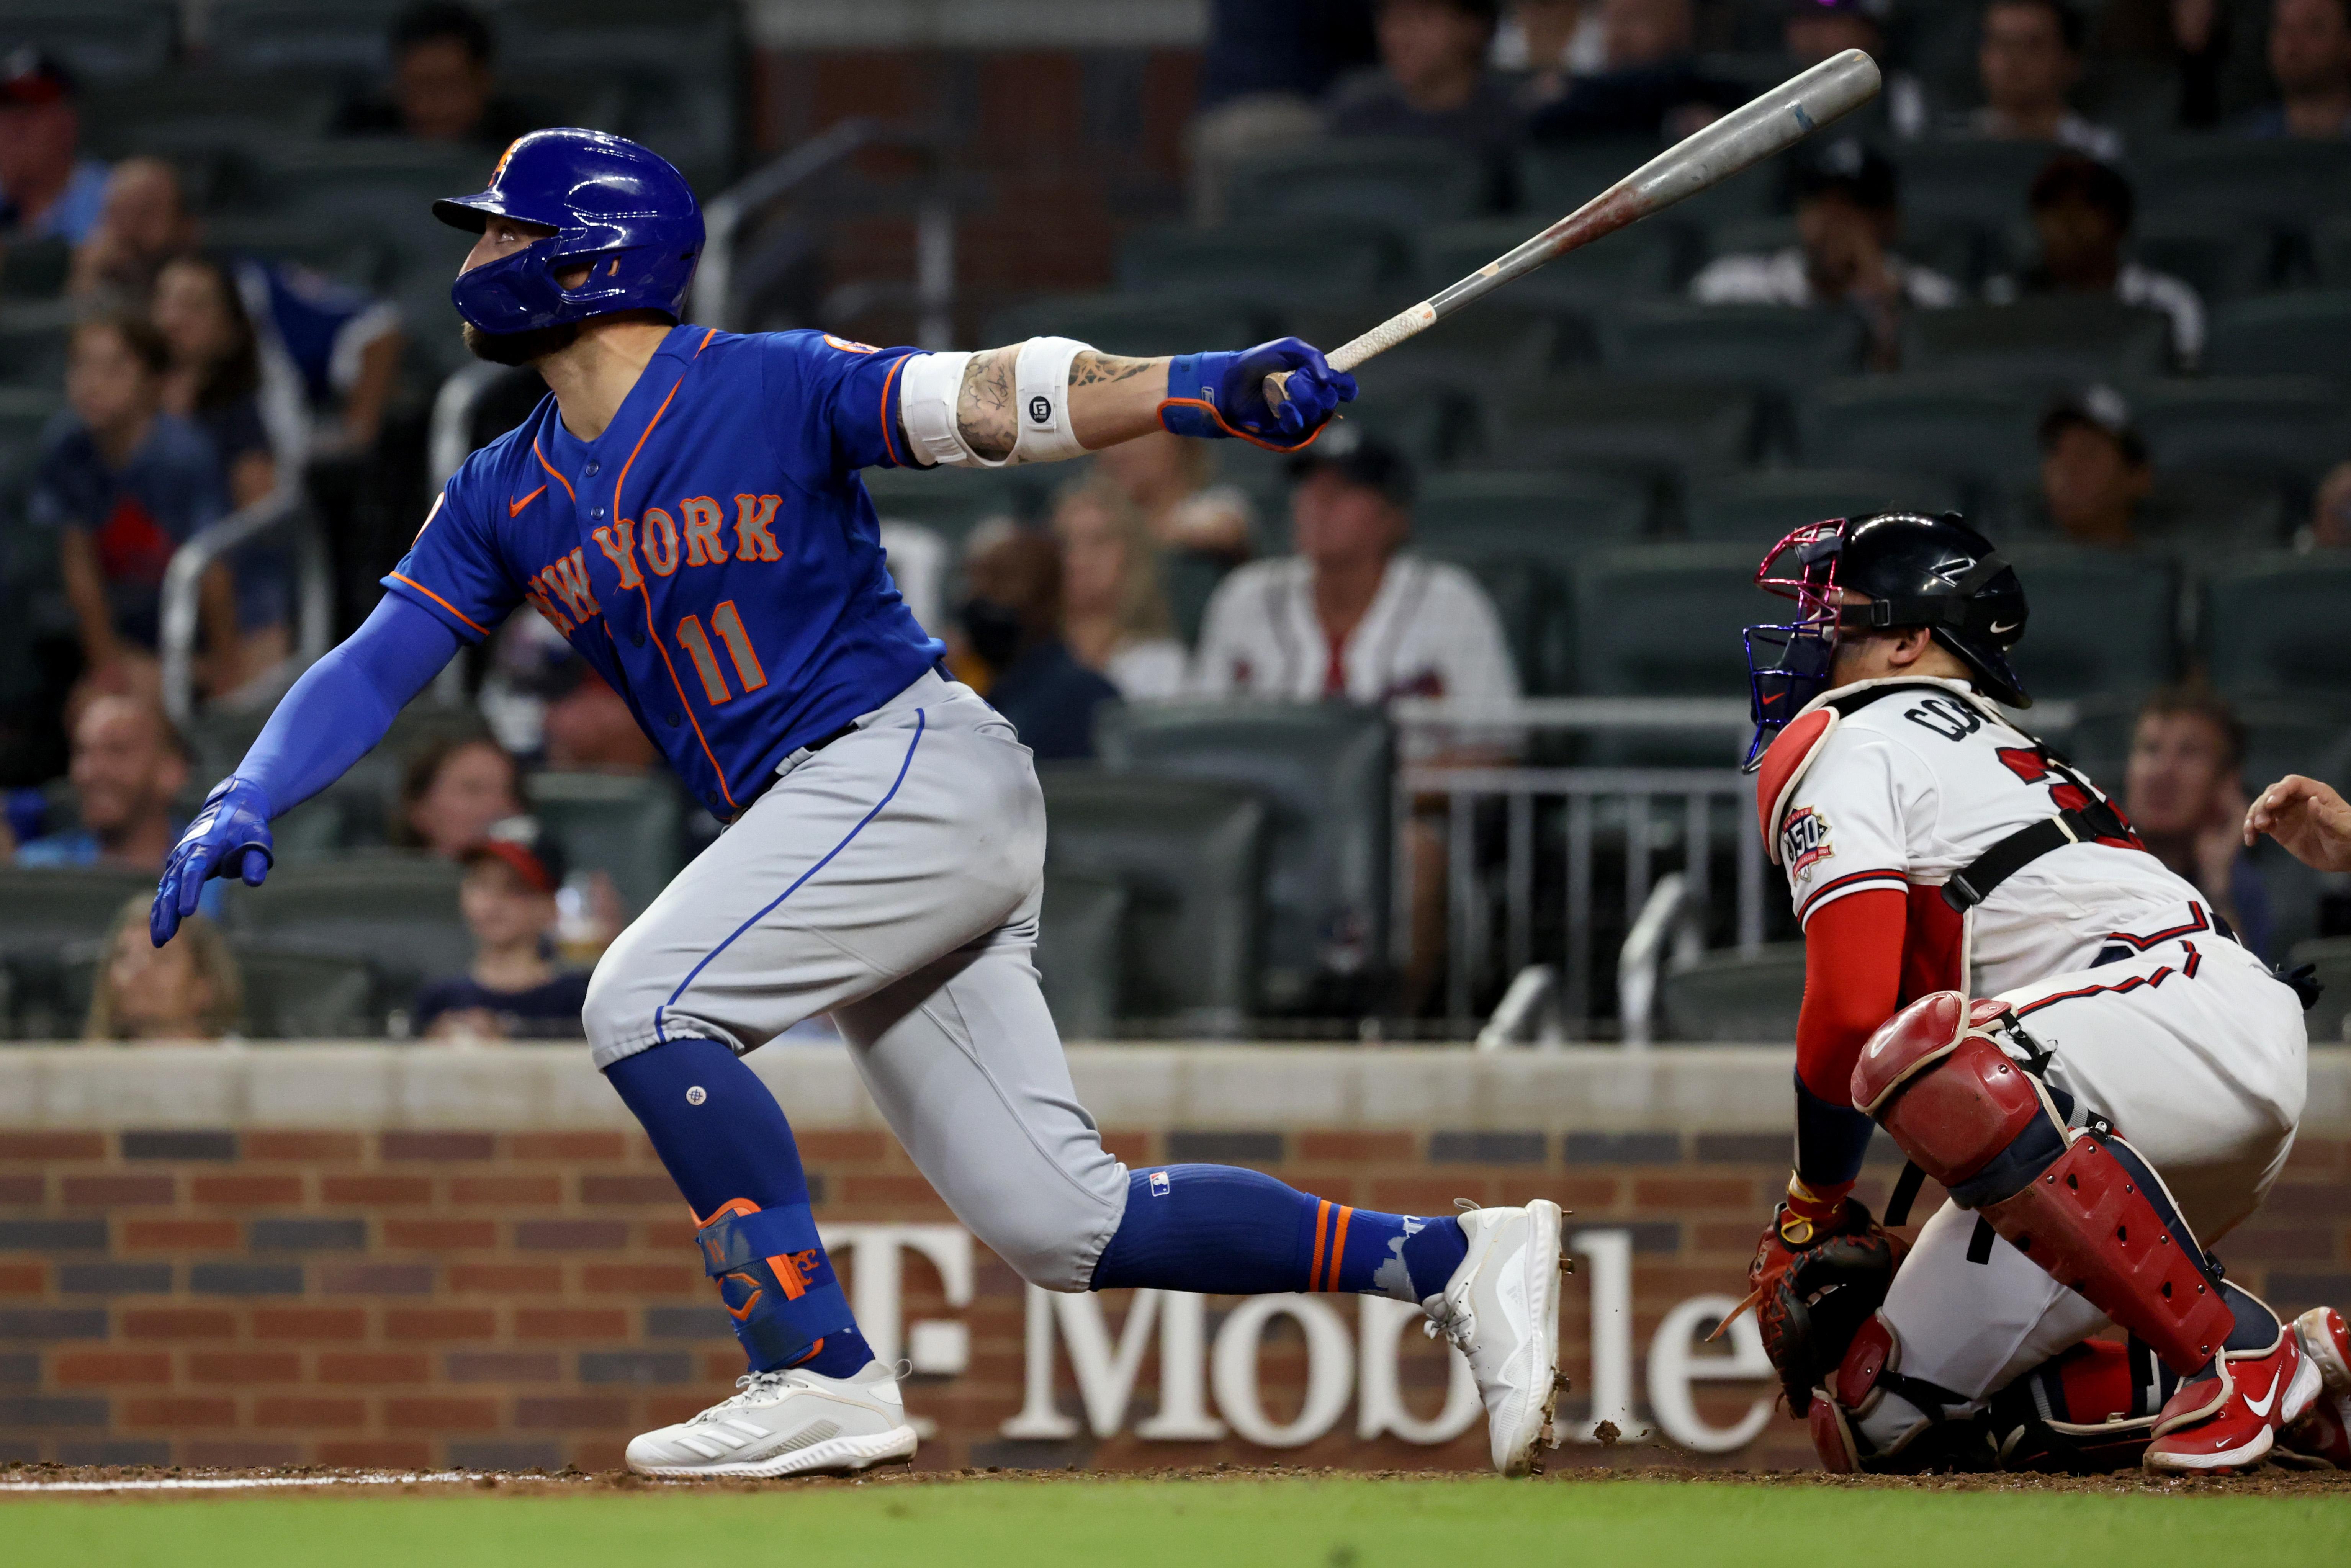 10/3/21 Game Preview: New York Mets at Atlanta Braves